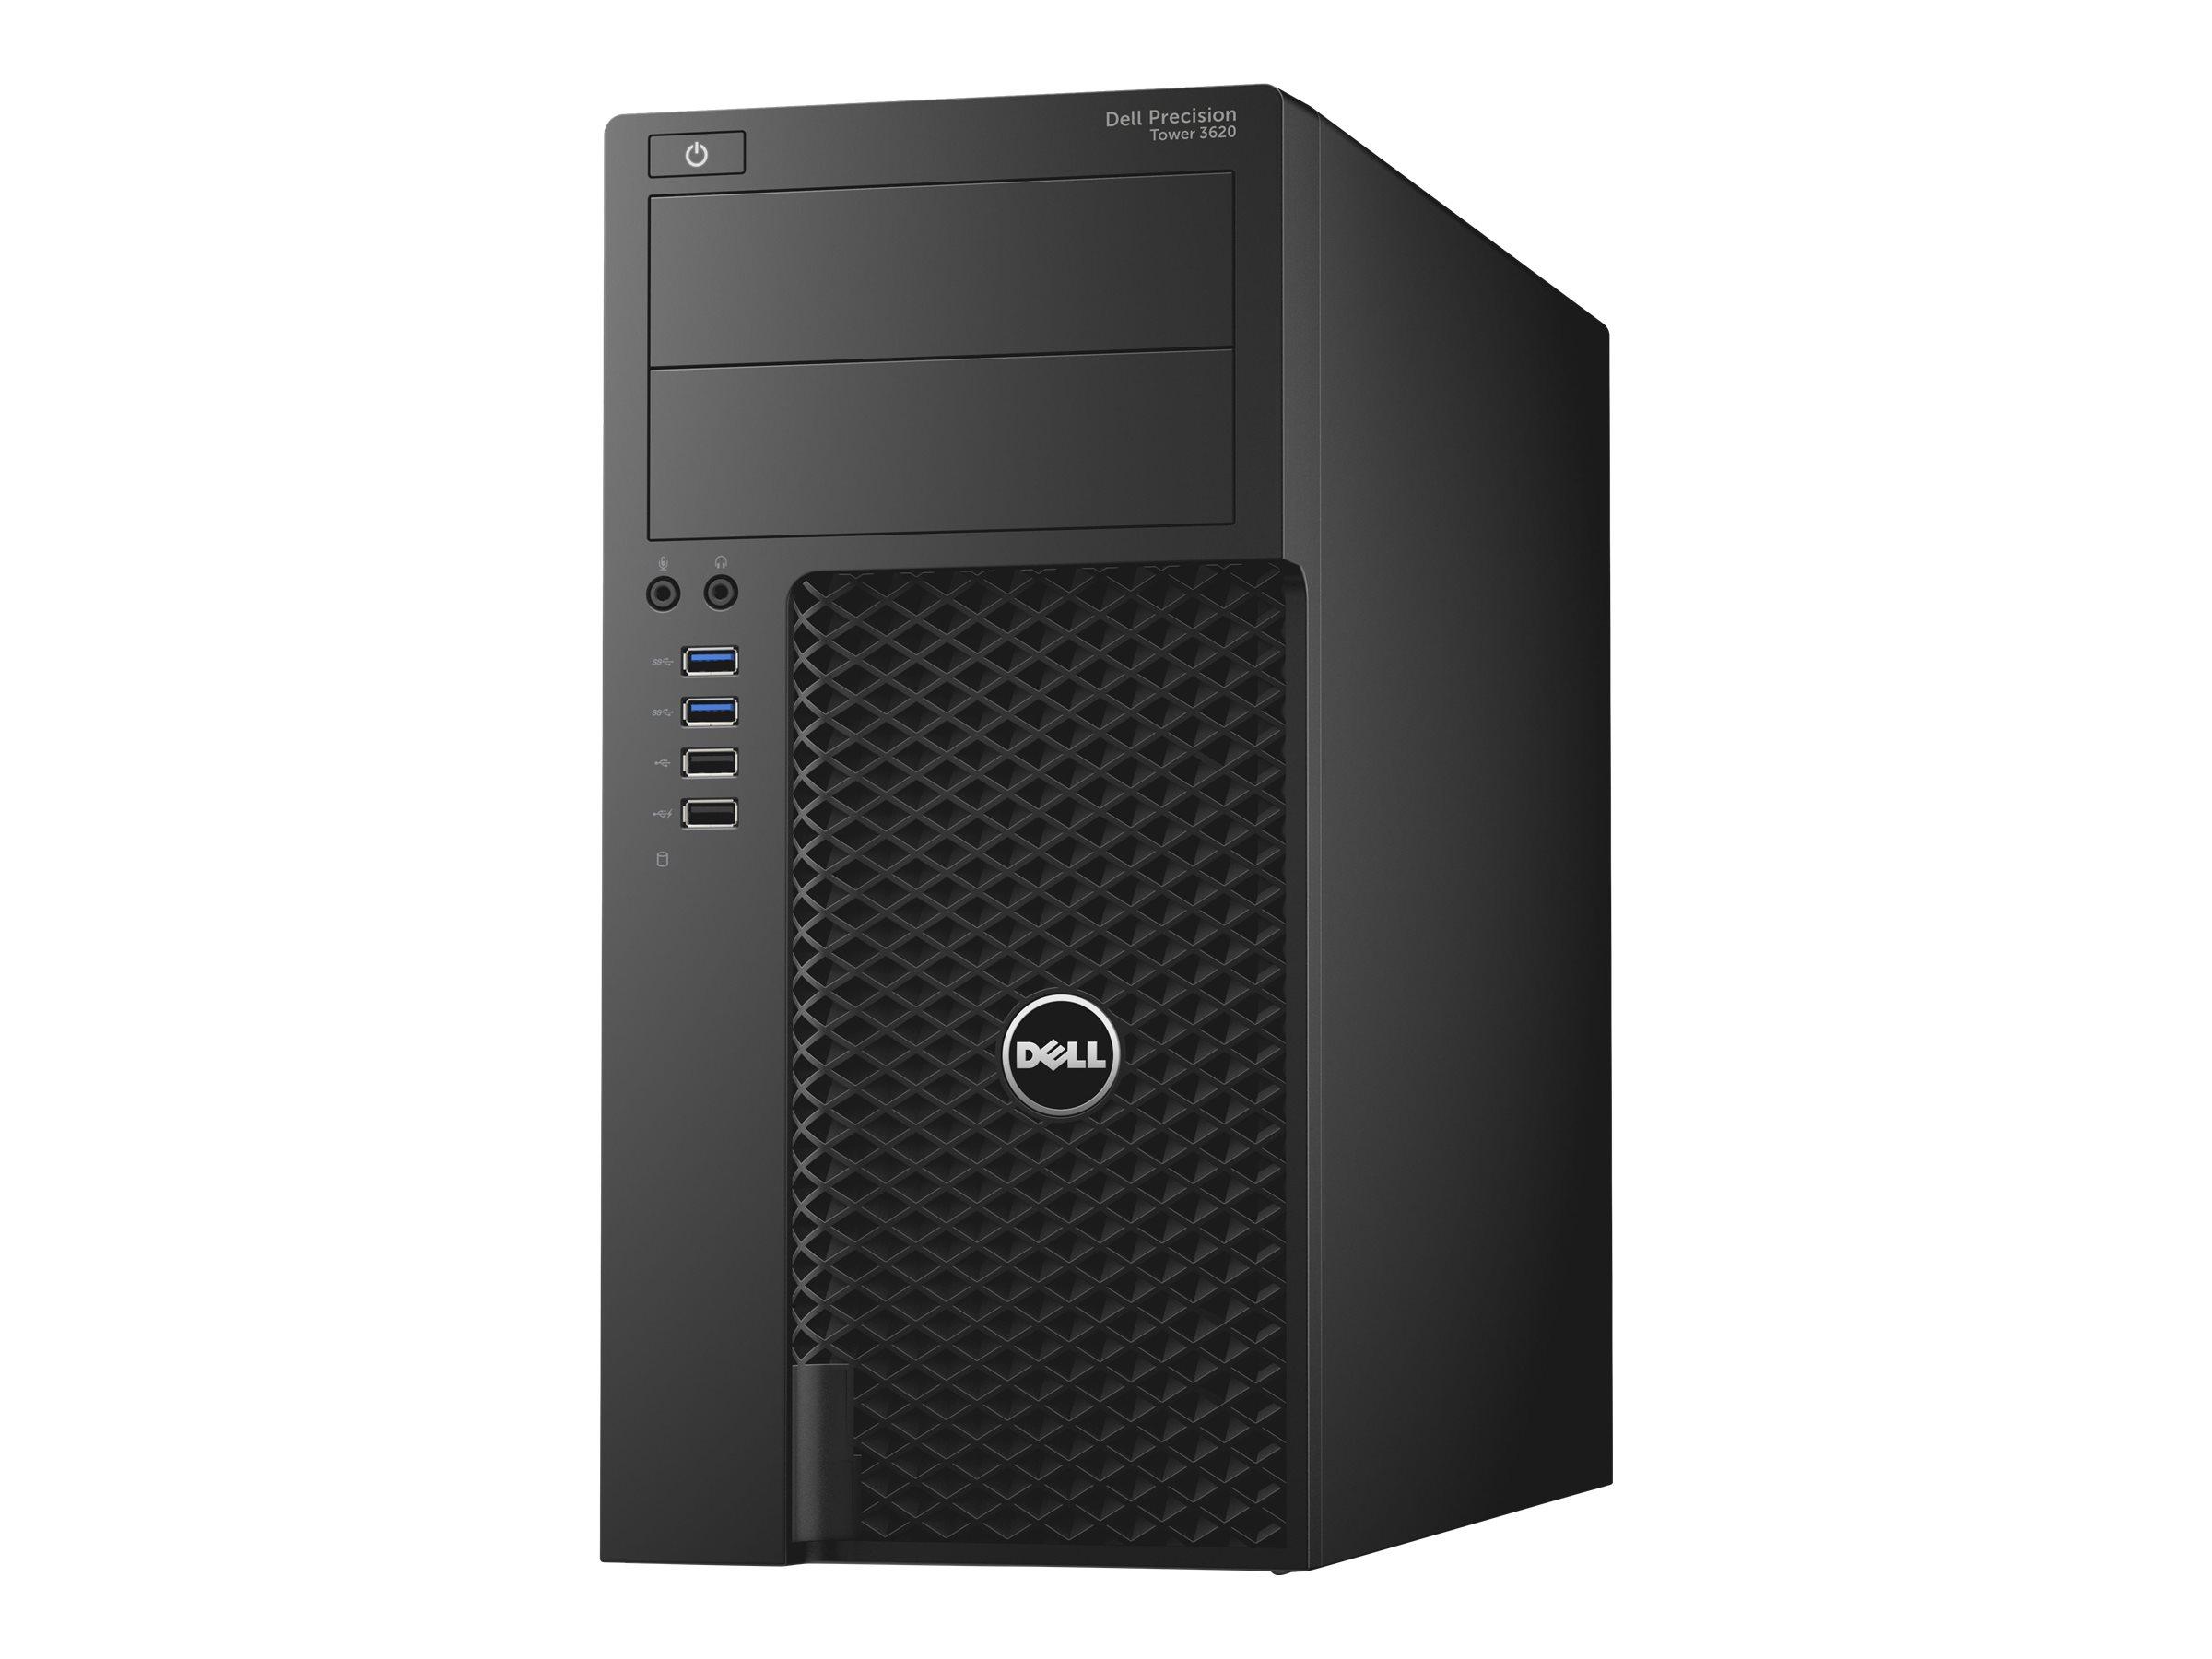 Dell Precision Tower 3620 - MT - 1 x Core i7 6700 / 3.4 GHz - RAM 8 GB - SSD 256 GB - DVD-Writer - Quadro P600 - GigE -